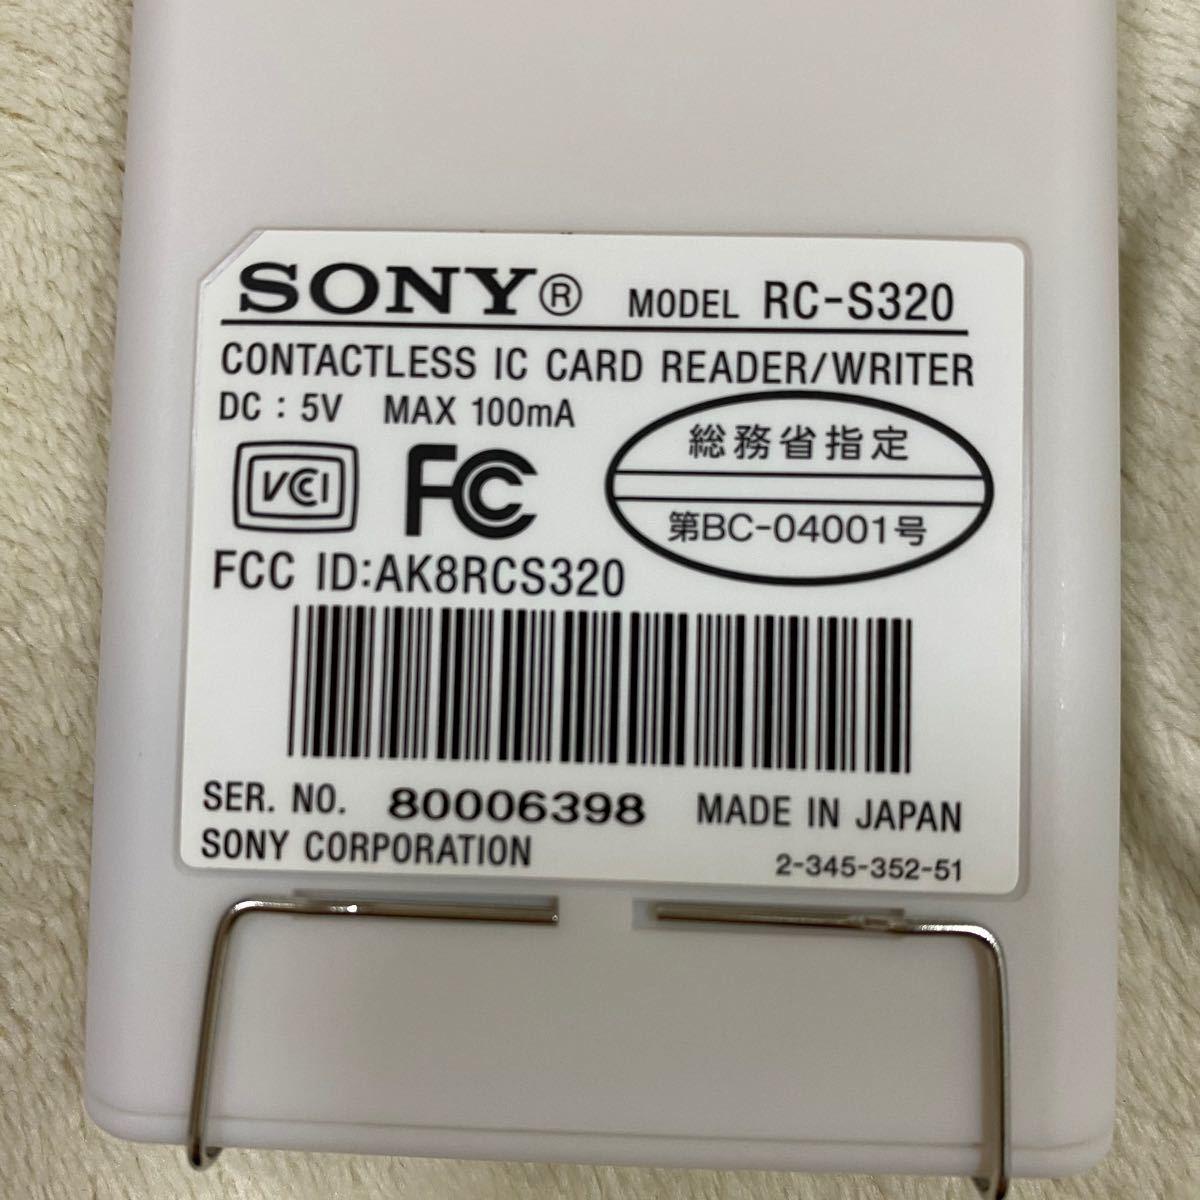 SONY 非接触ICカードリーダー/ライター PaSoRi RC-S320